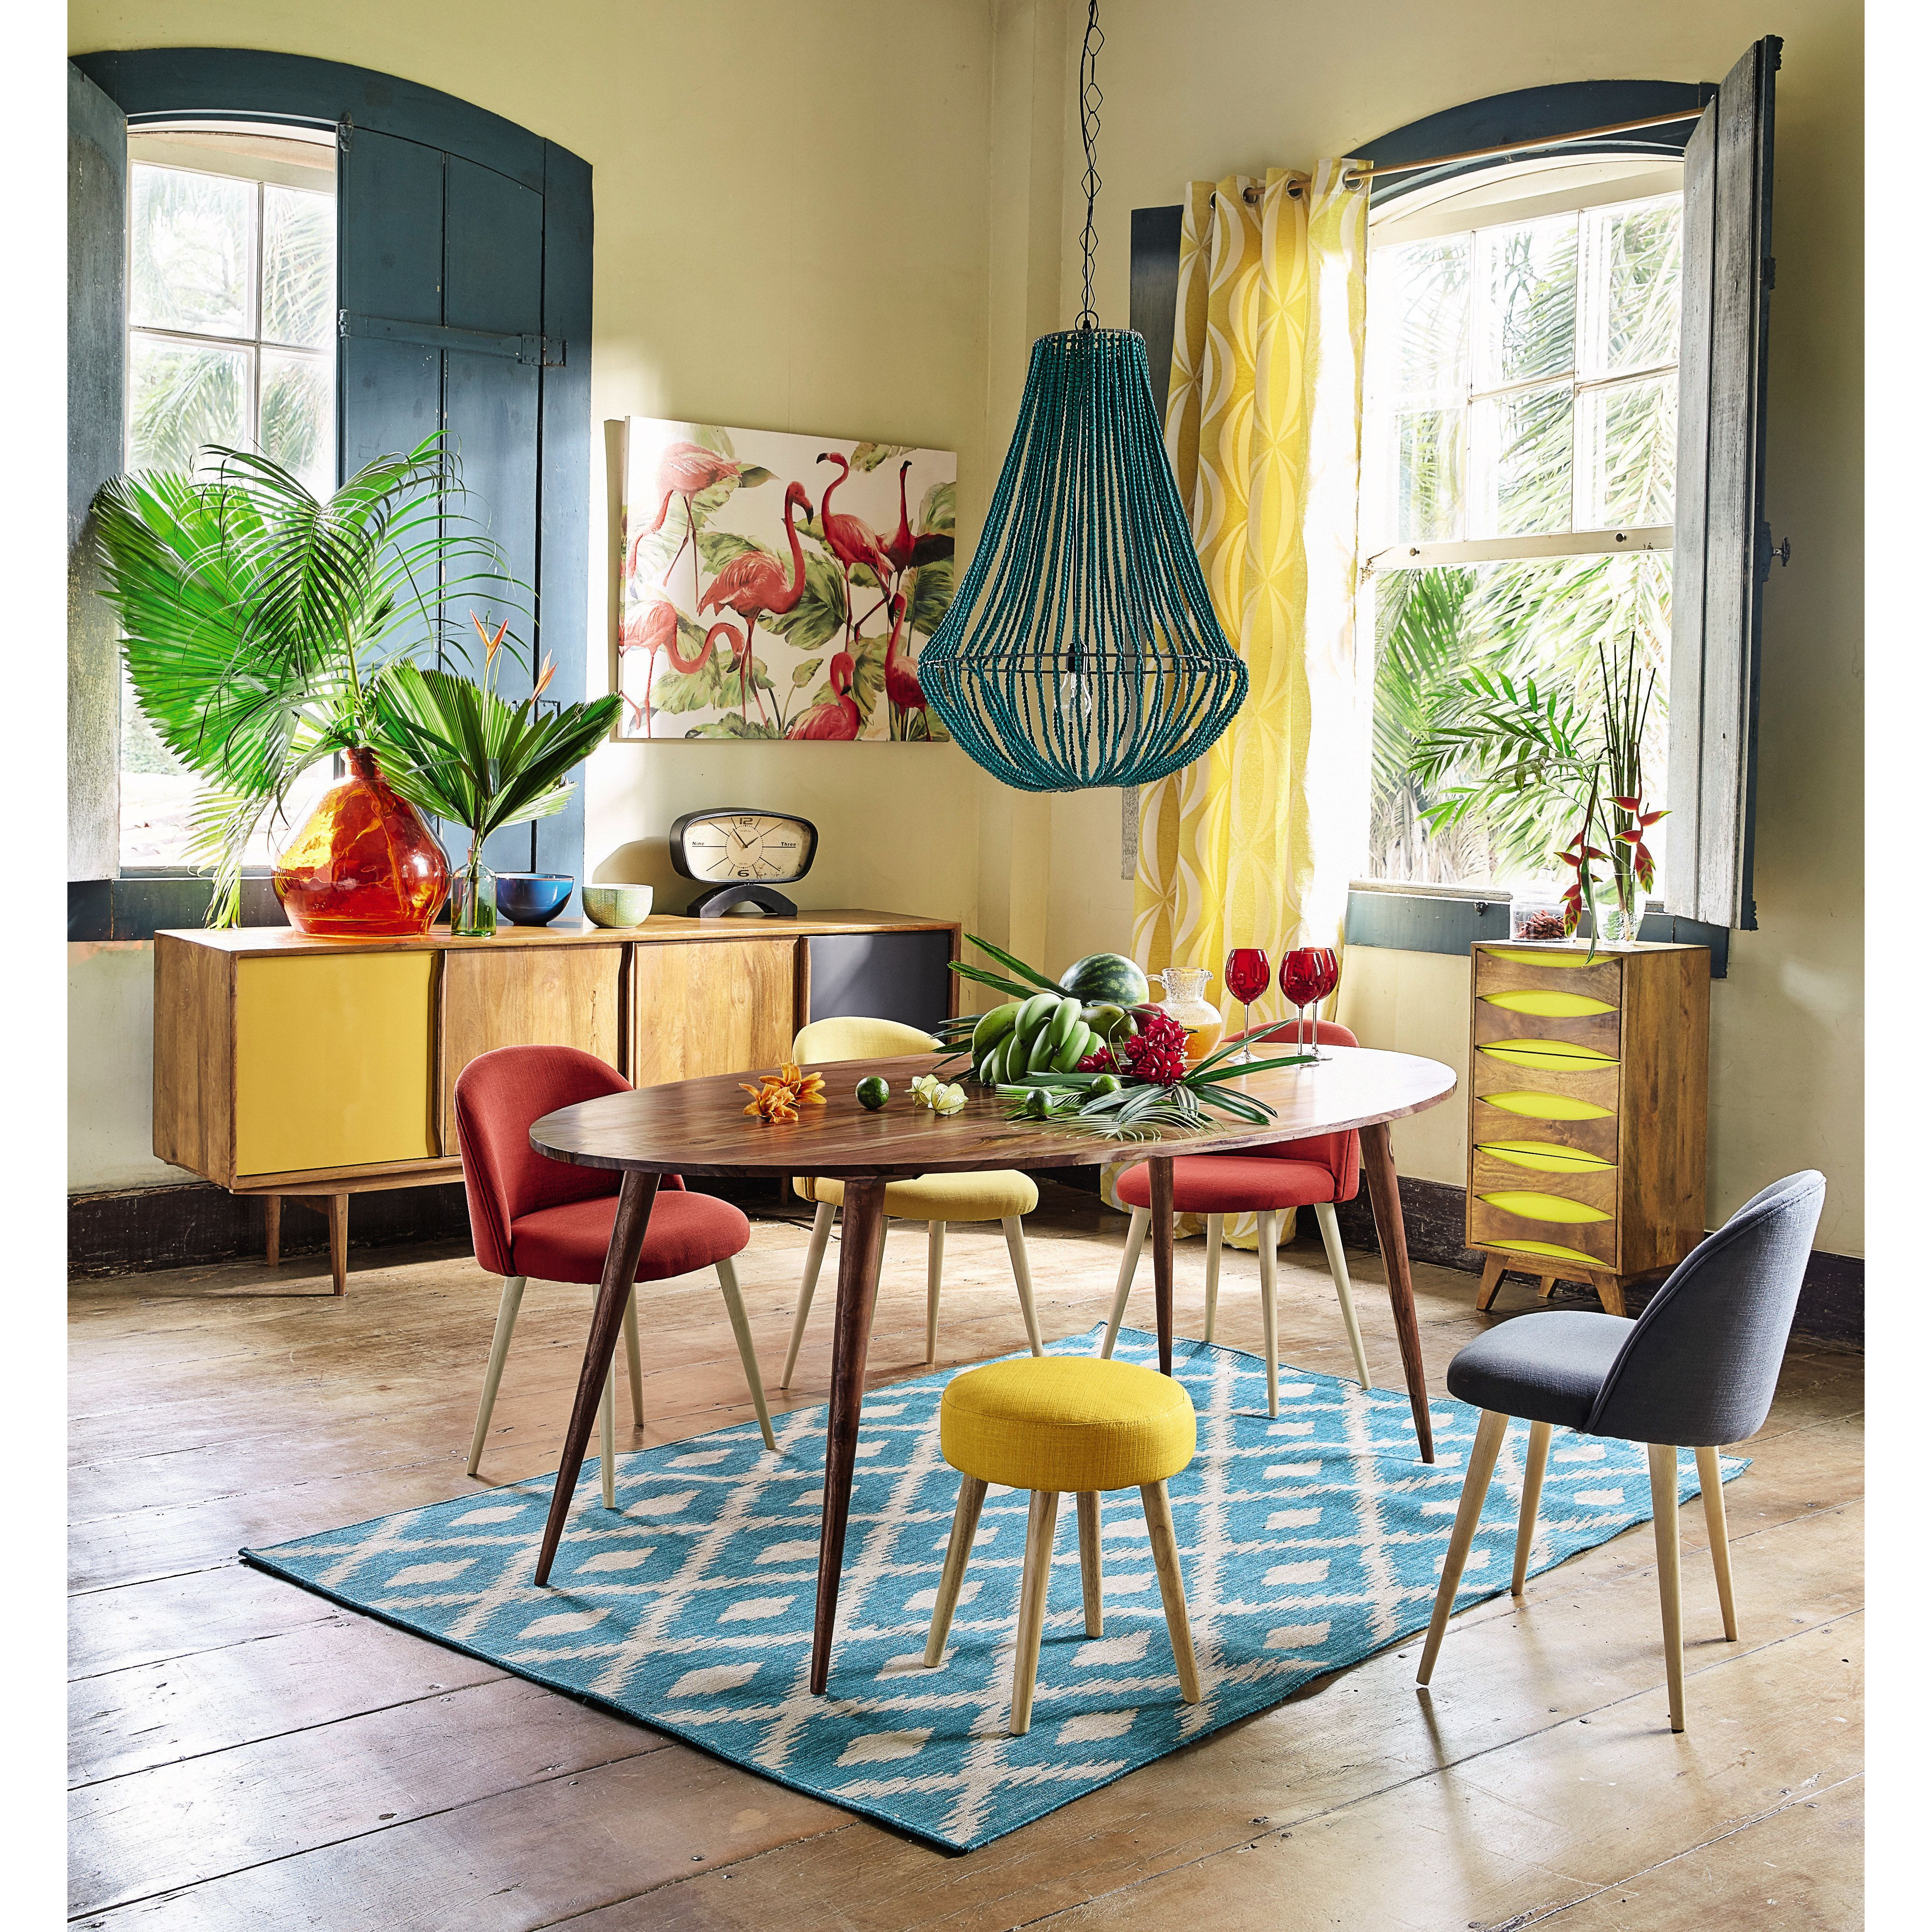 chaise vintage en tissu et bouleau massif jaune mauricette. Black Bedroom Furniture Sets. Home Design Ideas